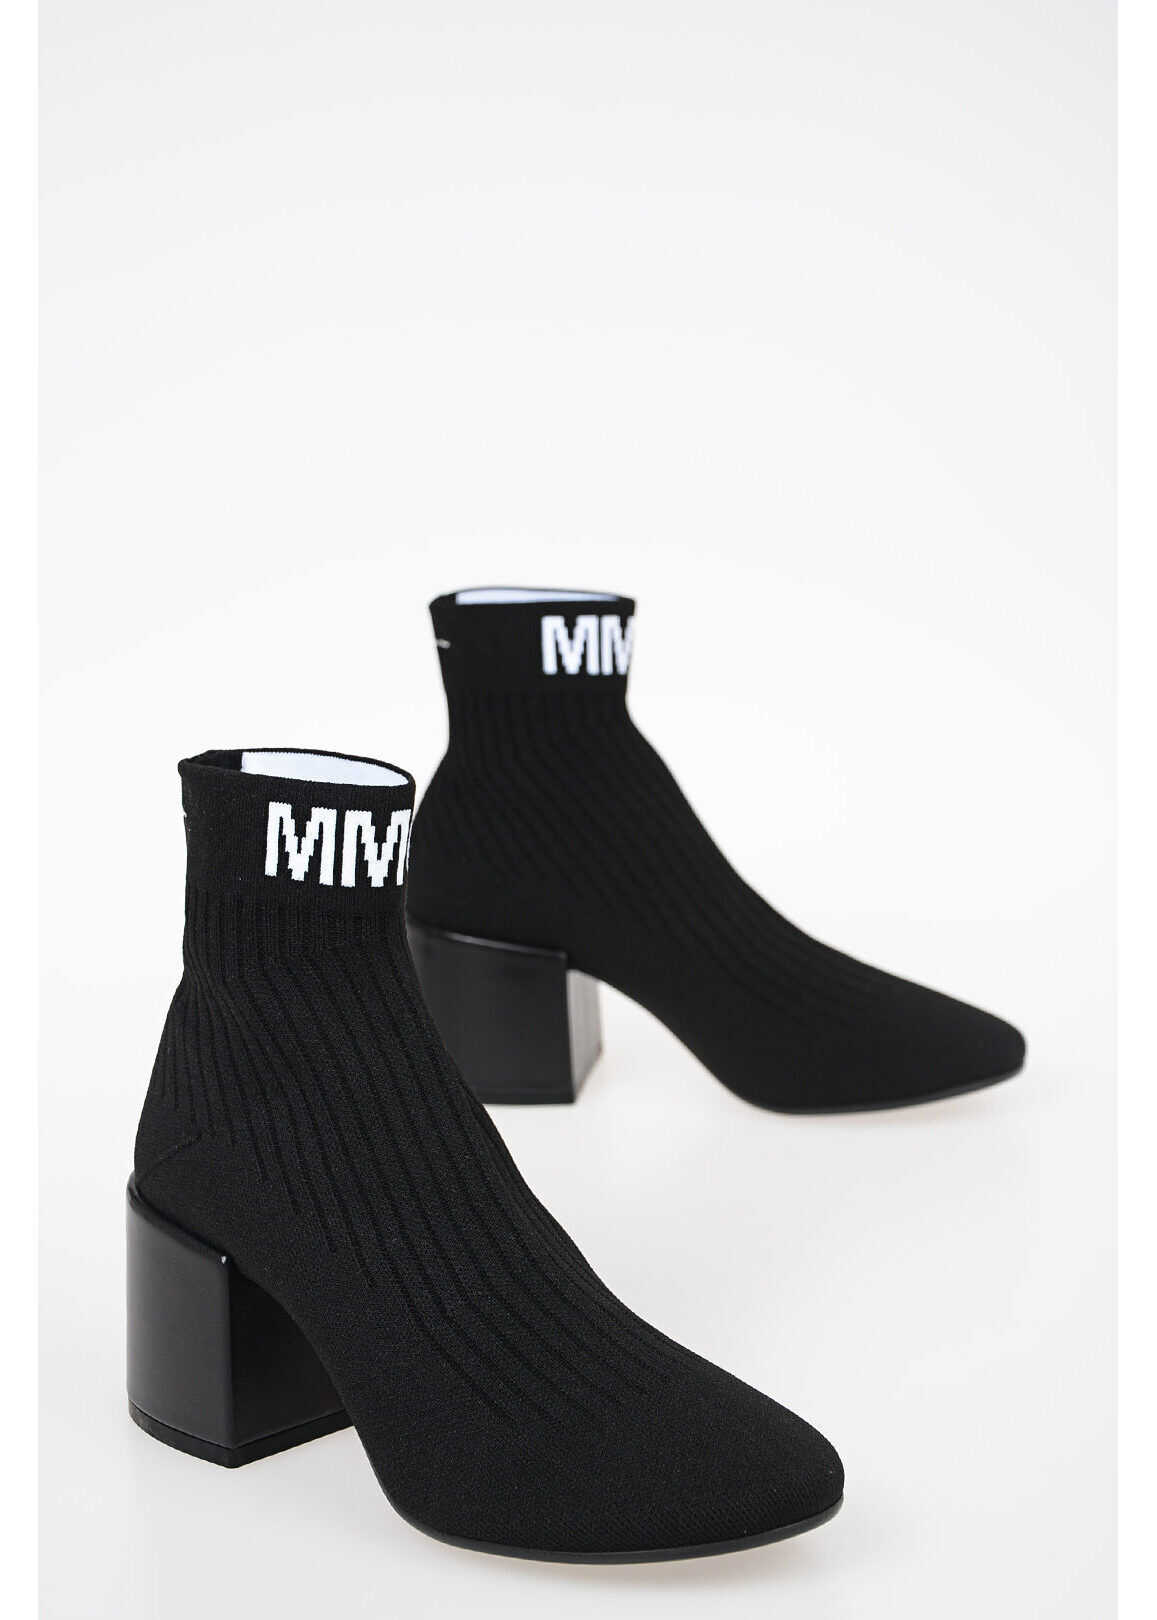 Maison Margiela MM6 6,5cm Fabric Socks FLARE Ankle Boots BLACK